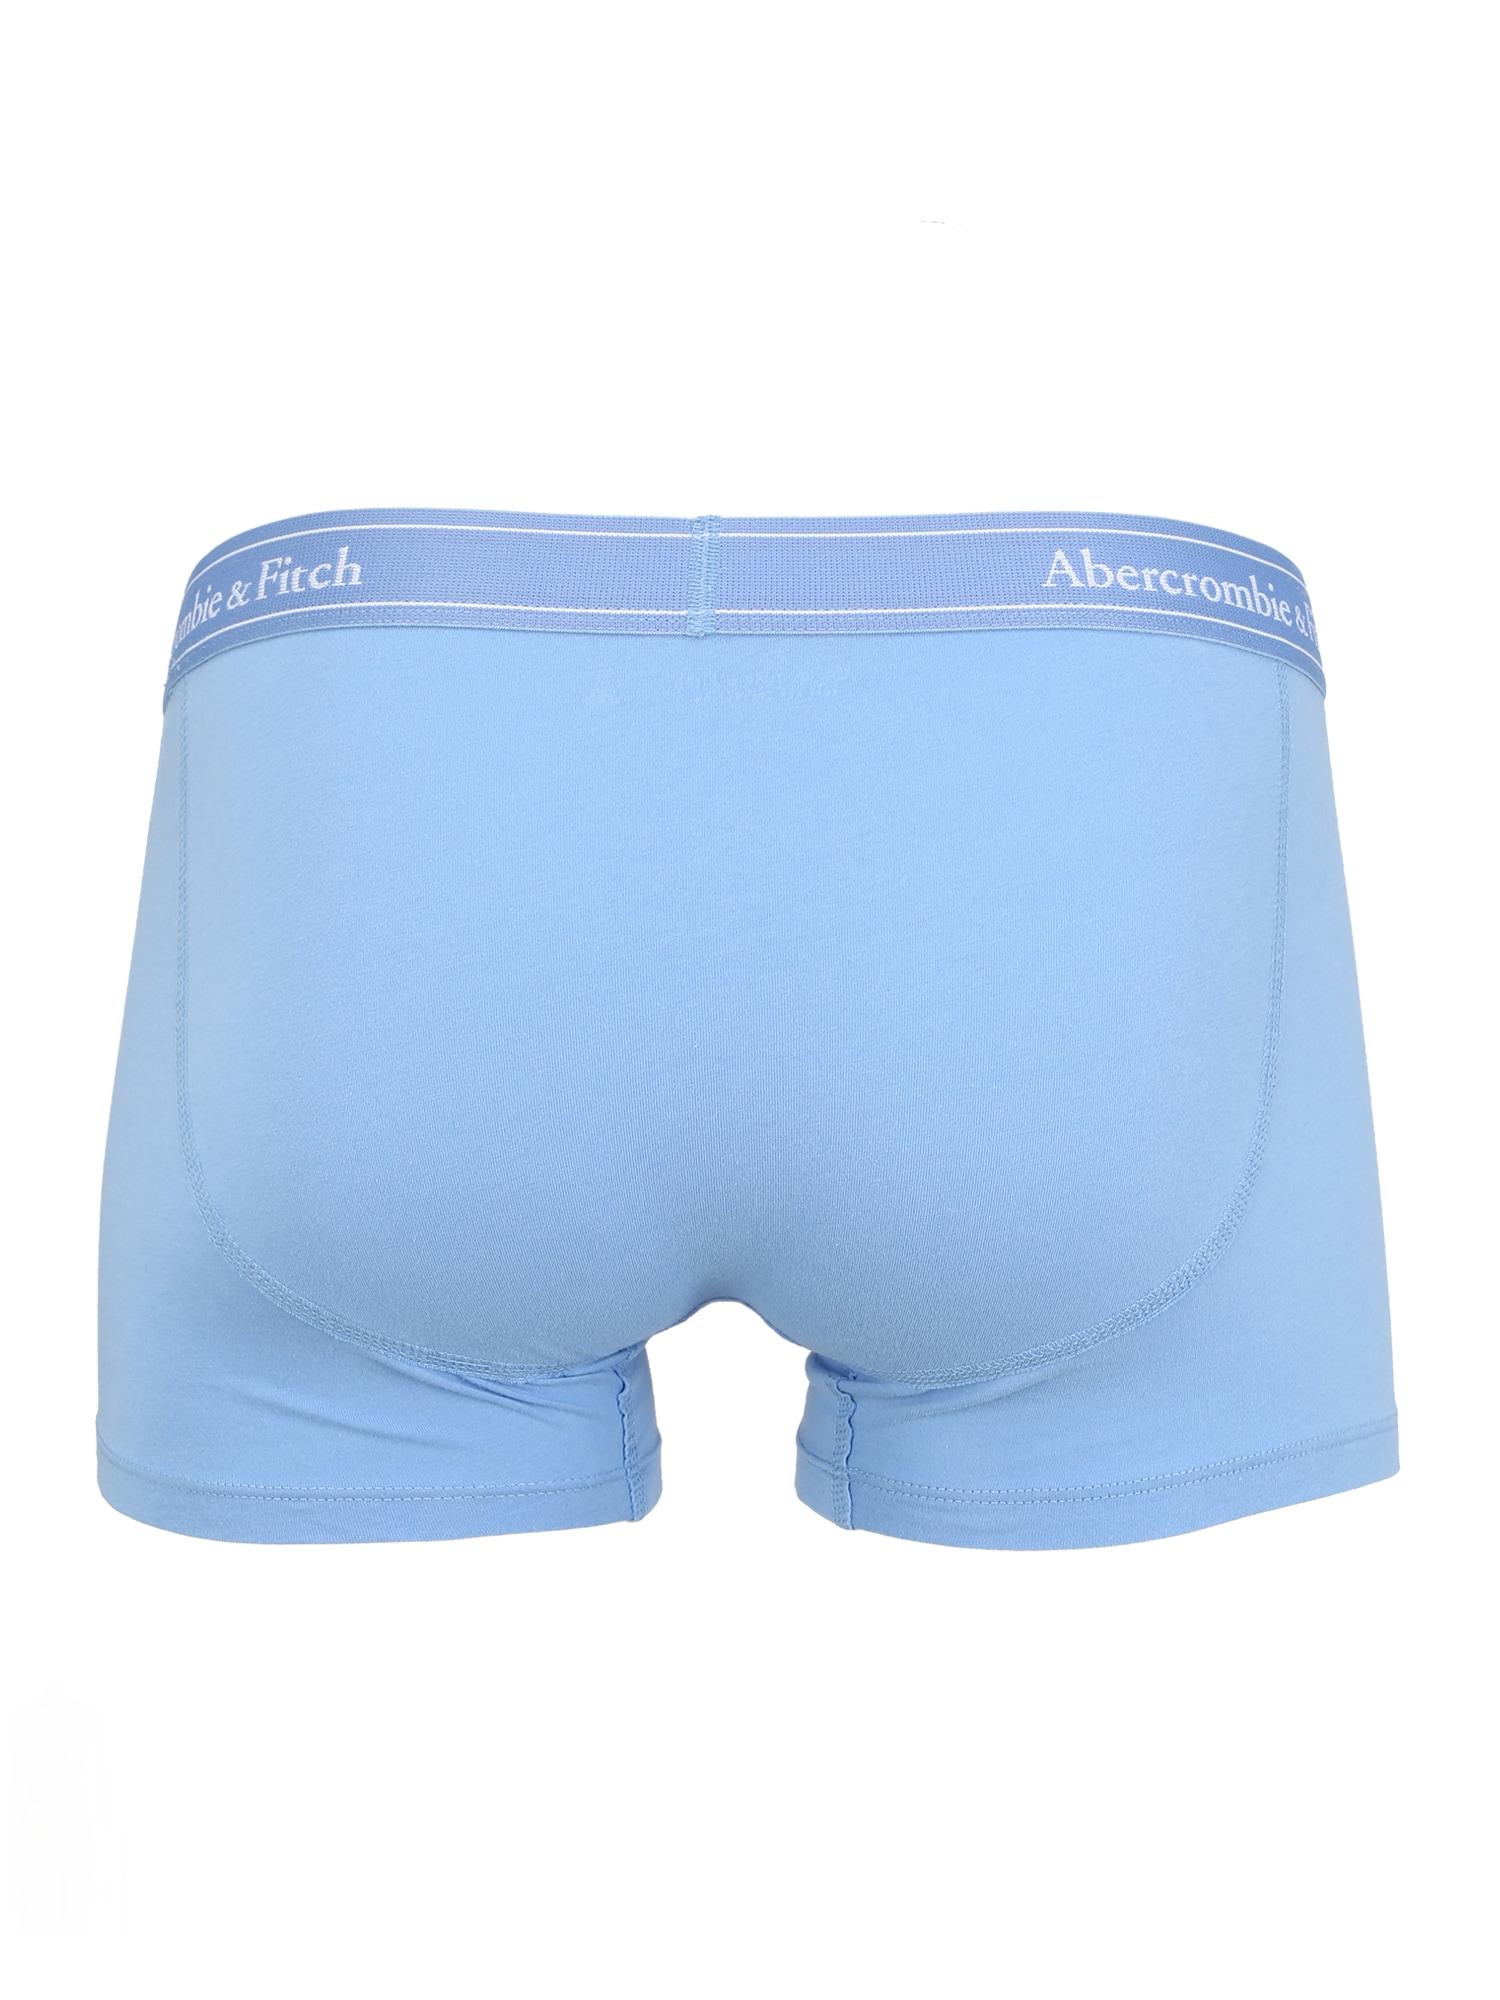 Abercrombie & Fitch Boxershorts  vit / blå / svart / gråmelerad